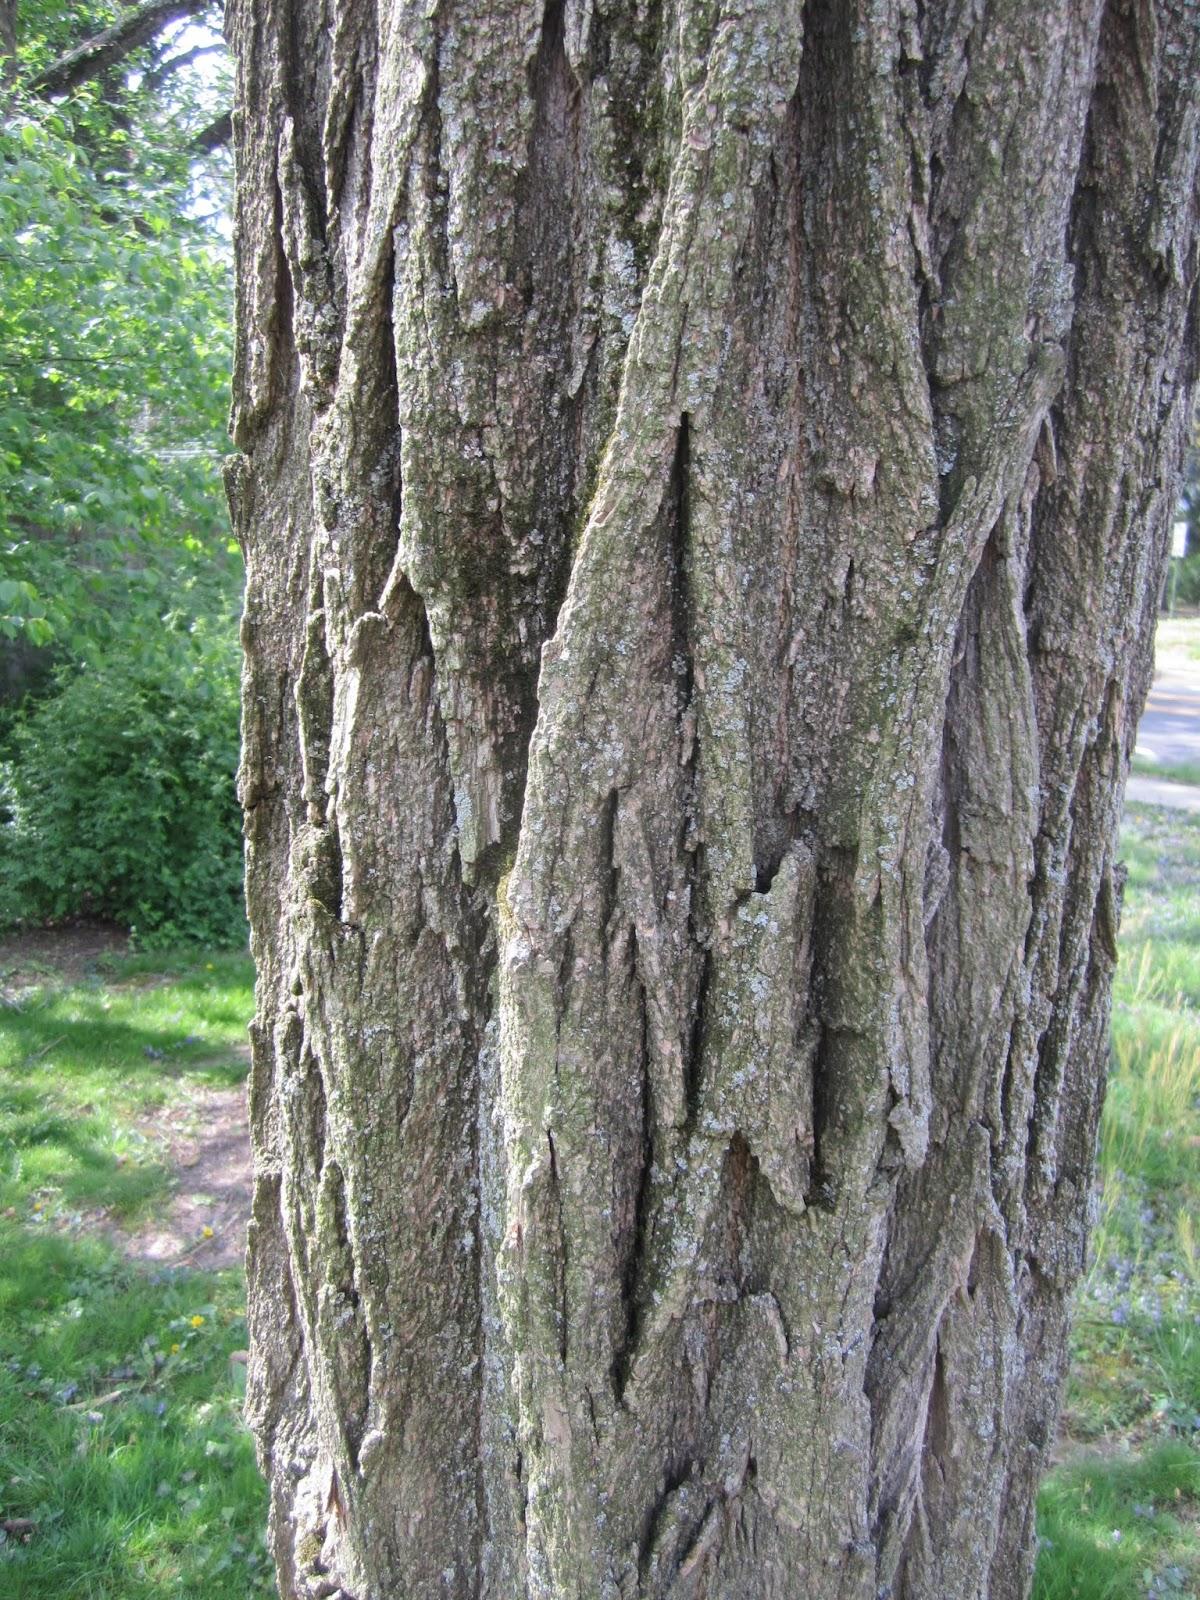 Black Locust in Bloom | Princeton Nature Notes